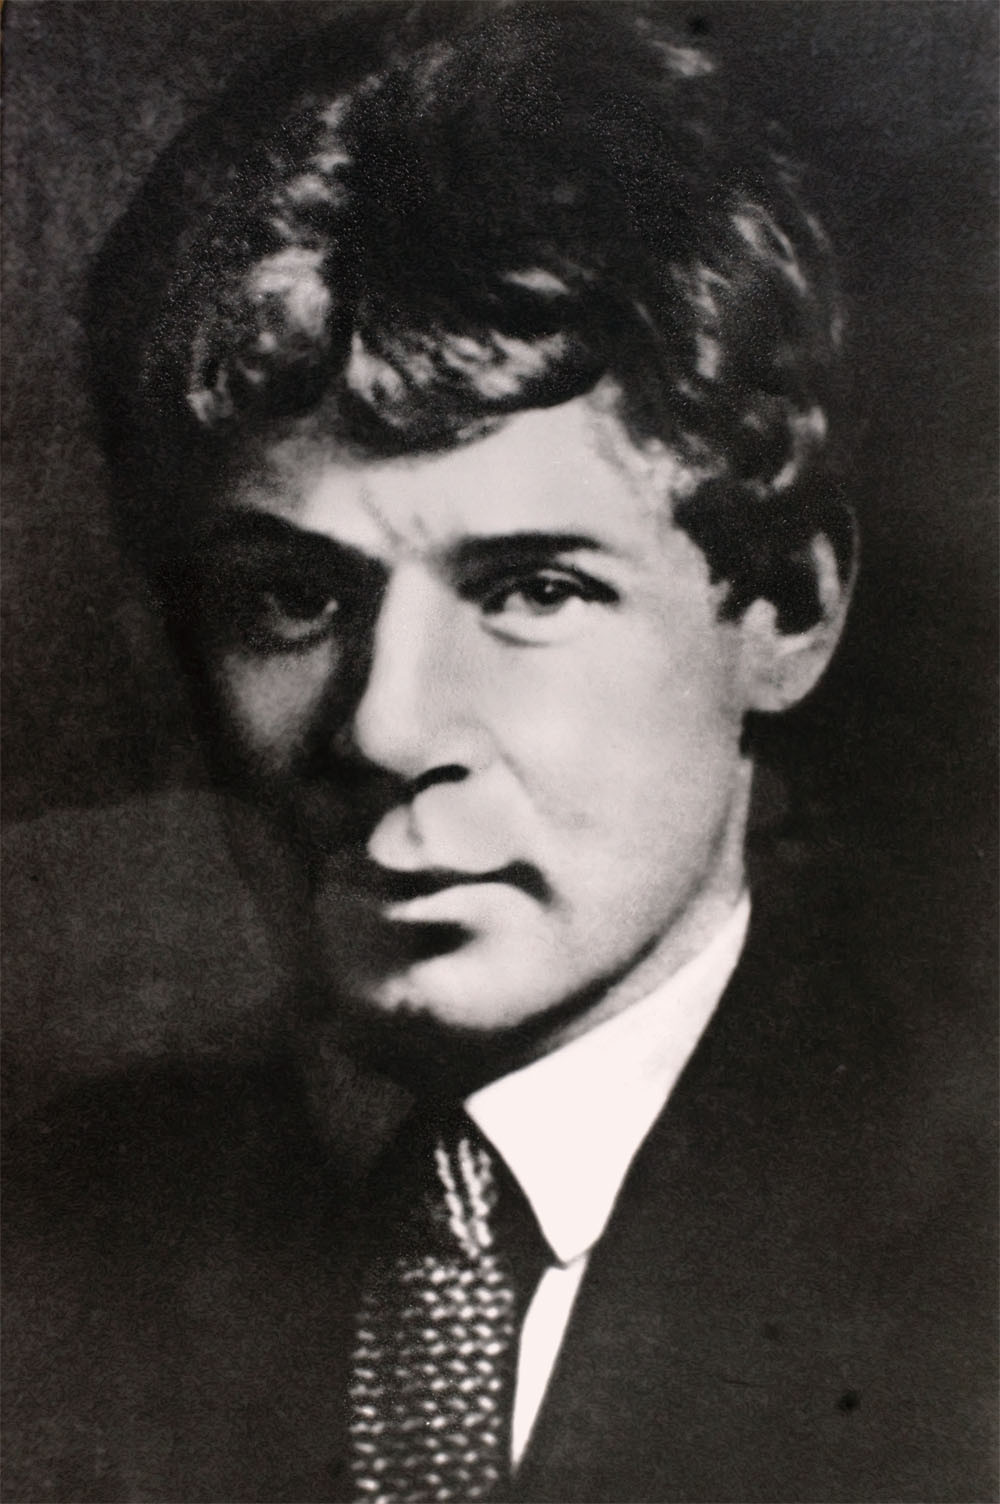 С. Есенин 1922 г.